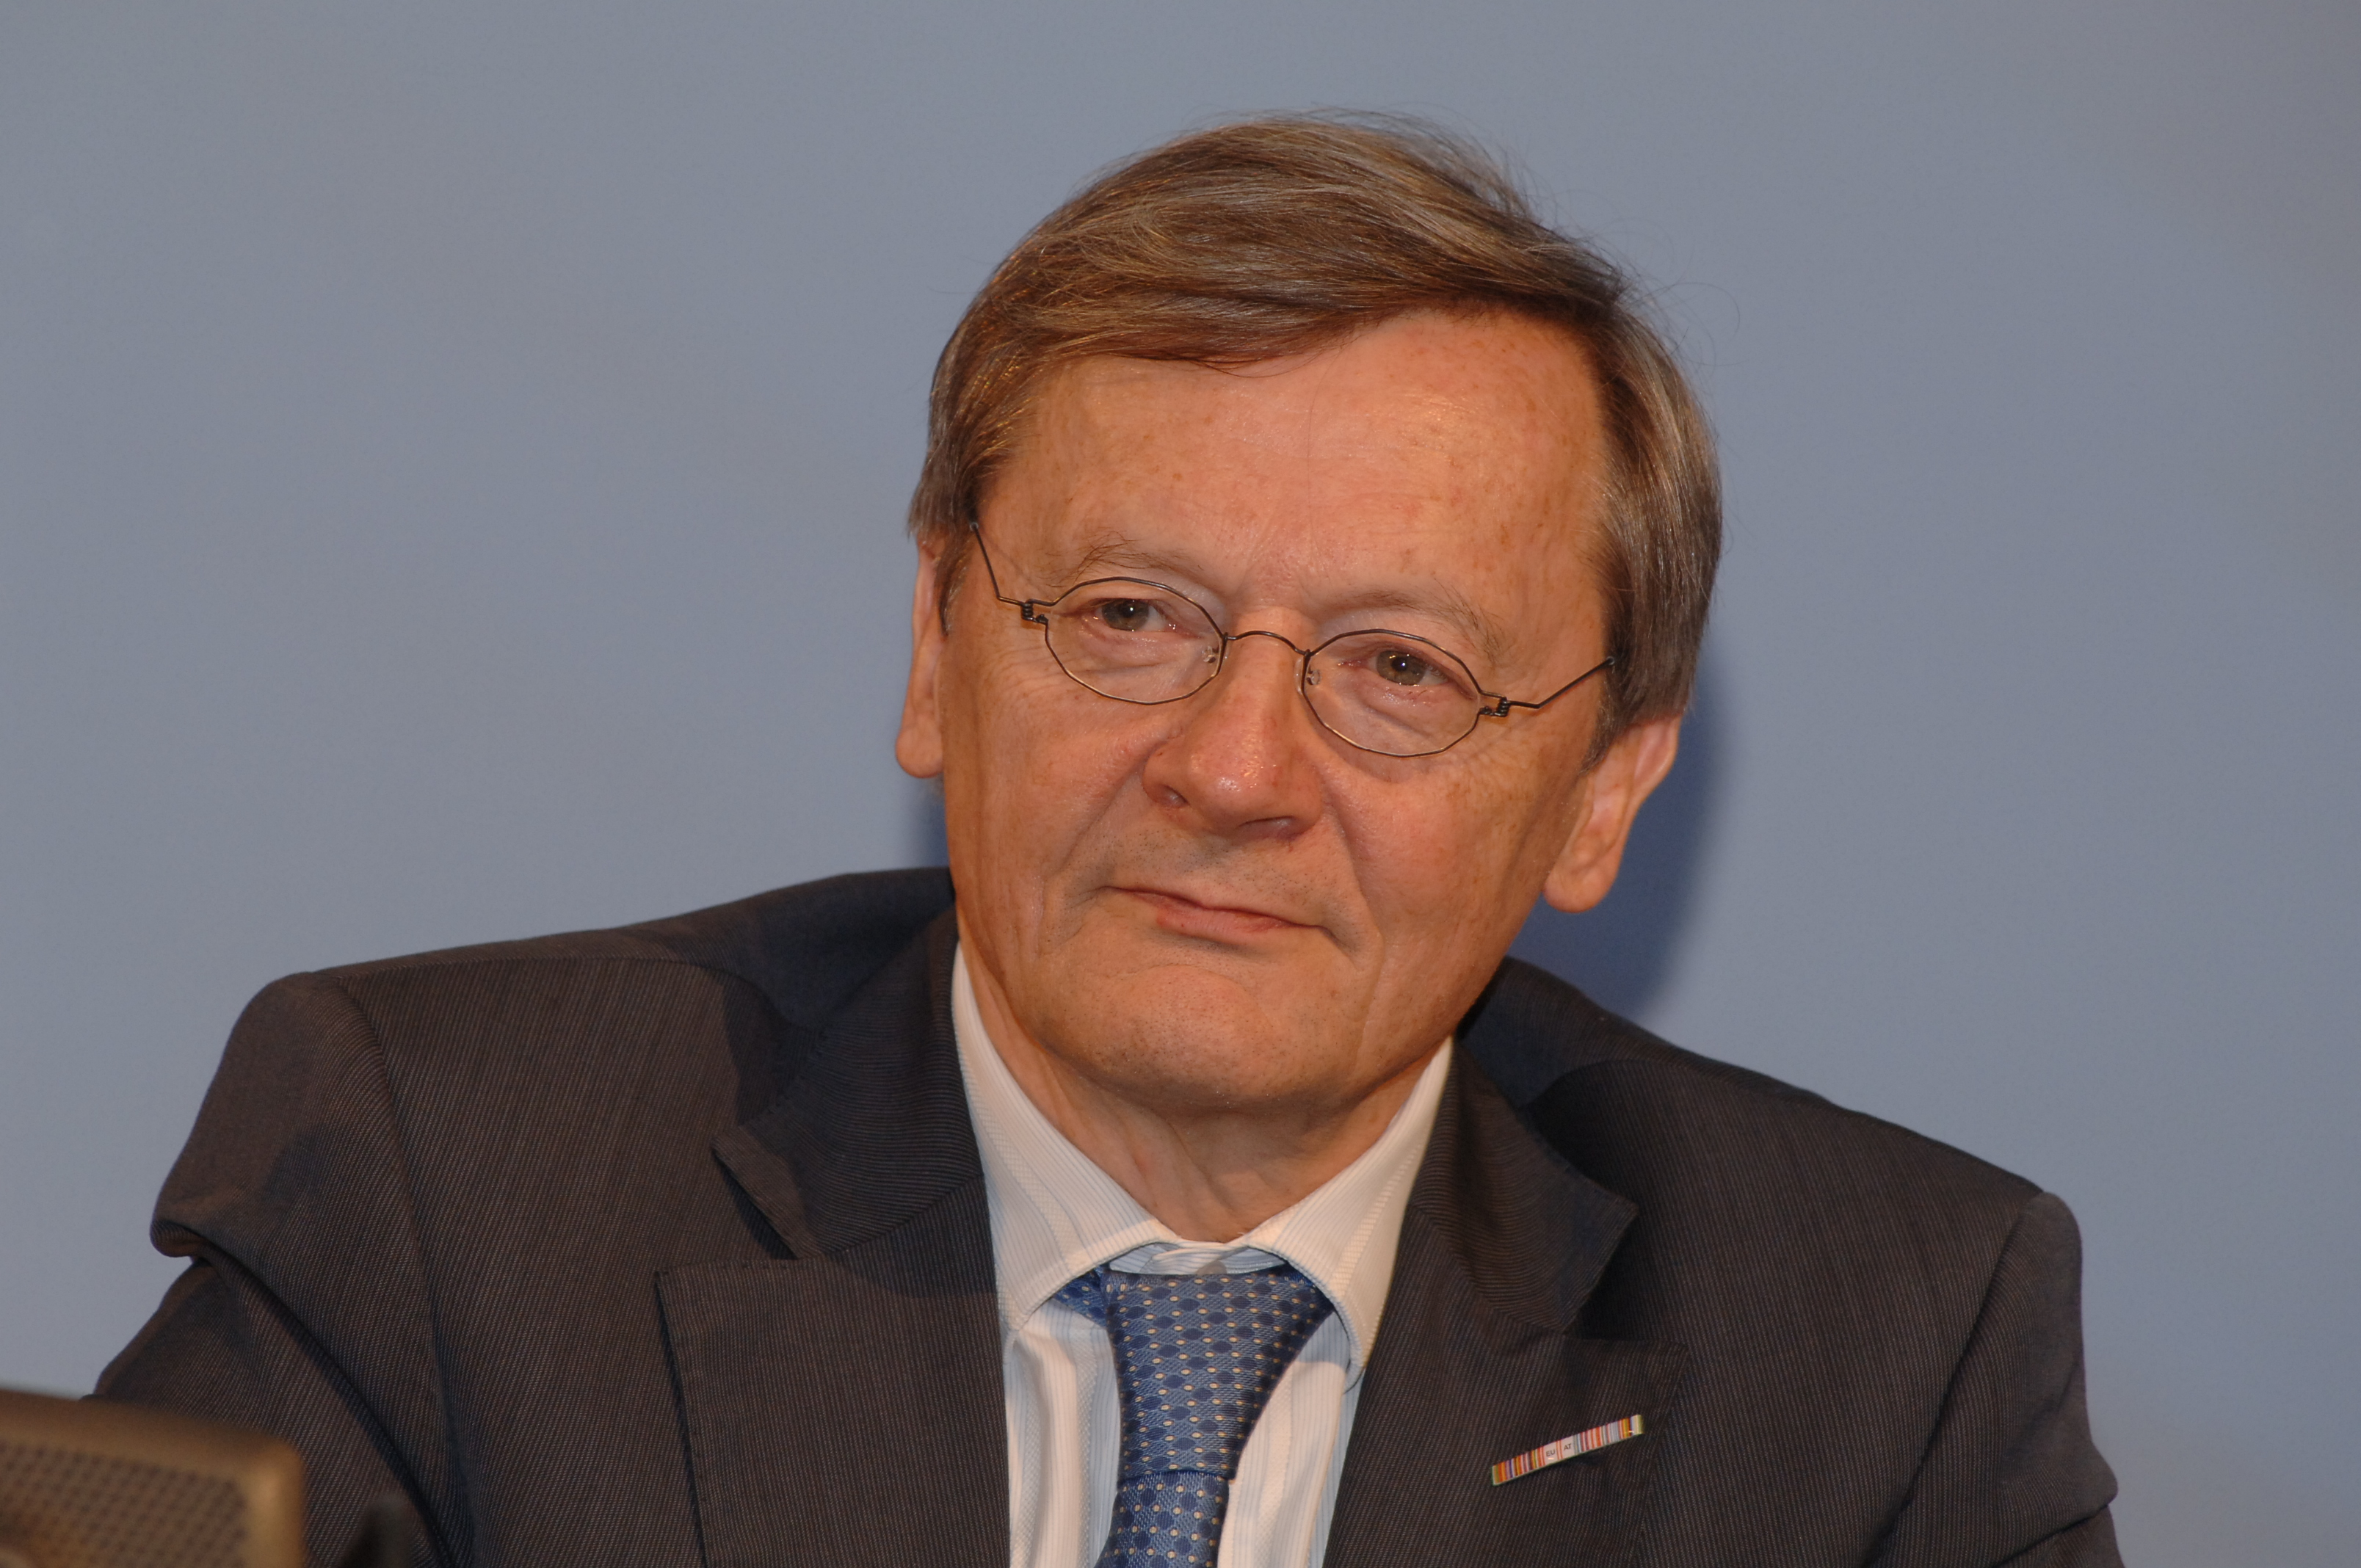 Bundesregierung Schüssel II – Wikipedia